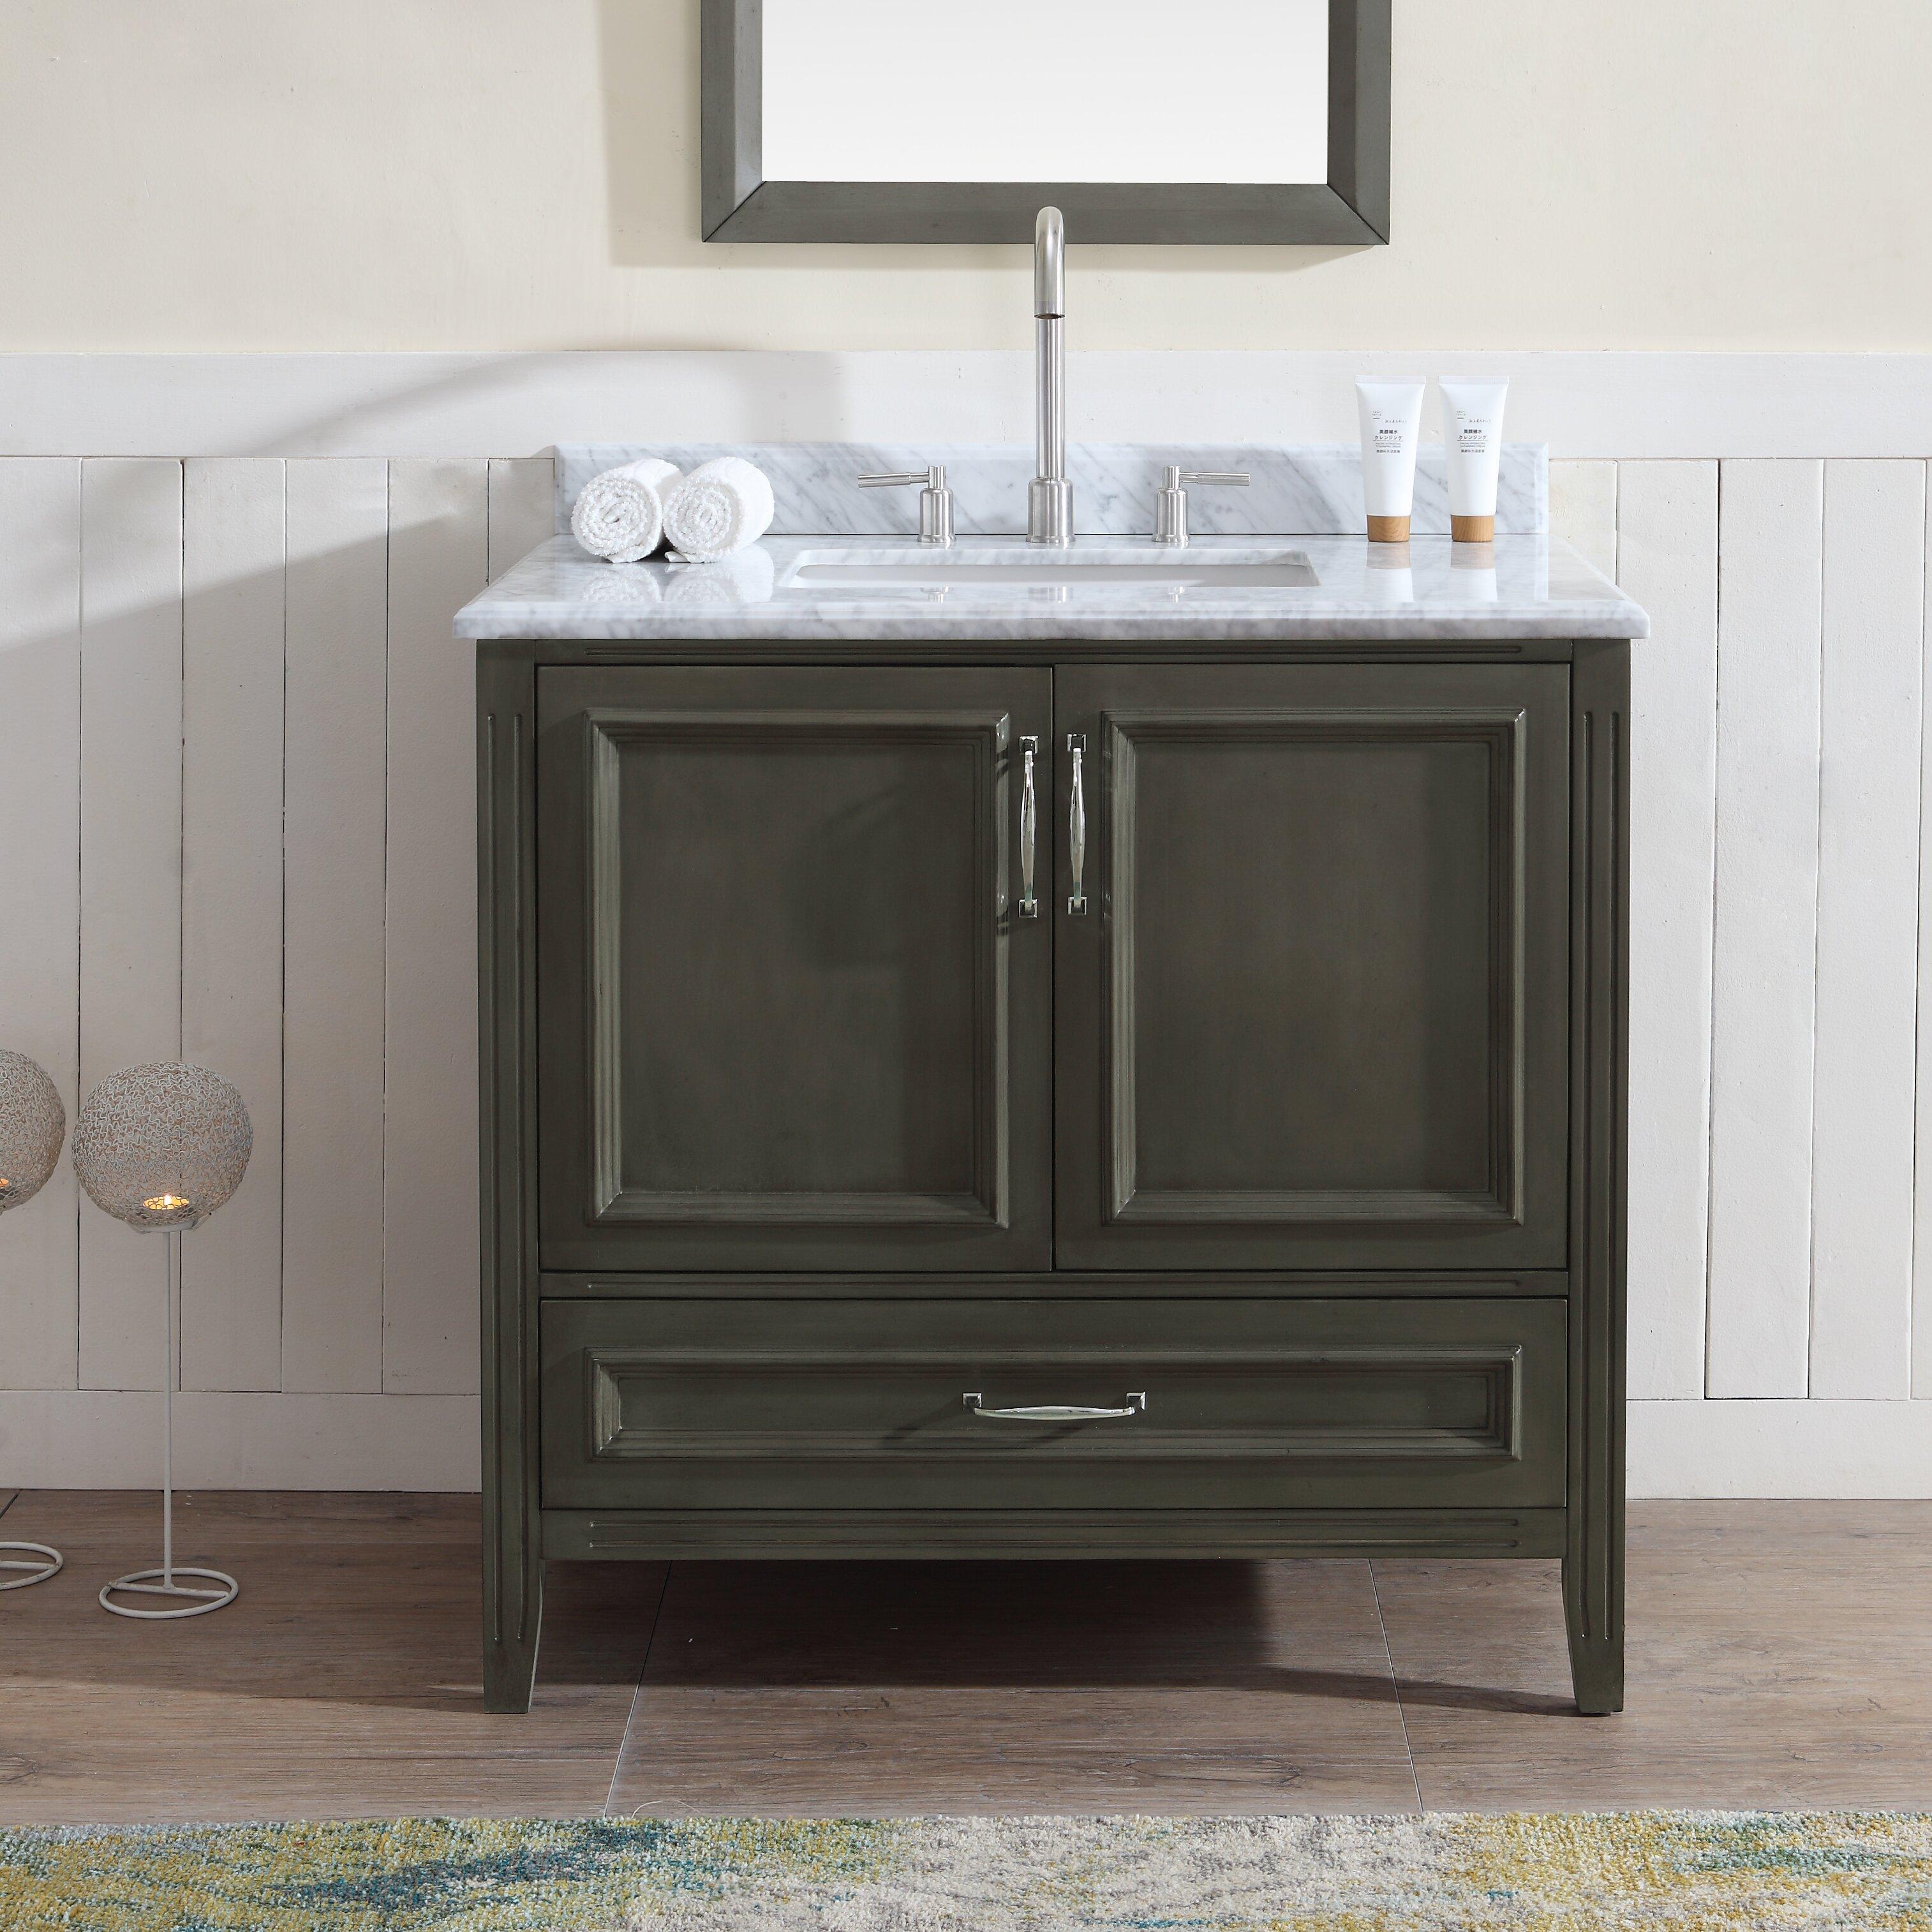 "Ari Kitchen & Bath Jude 36"" Single Bathroom Vanity Set"